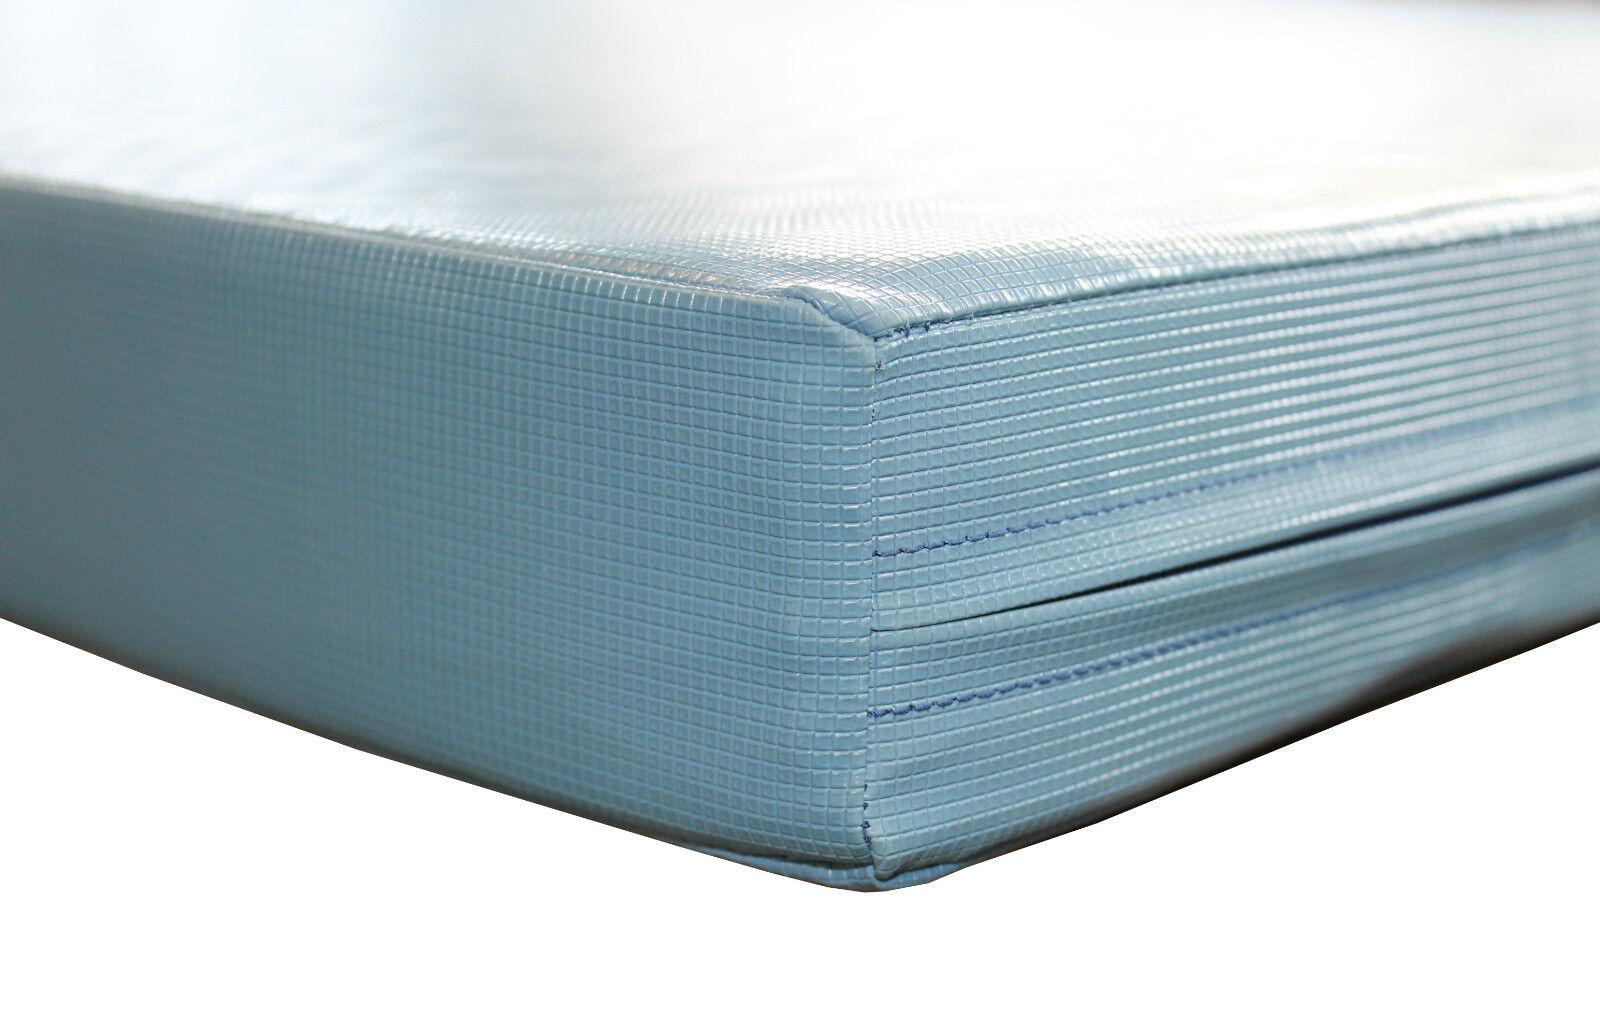 Grevinga® KIDS Superleichtturnmatte SOFT mit RAND (RG 200 22) 200 (RG x 100 x 8 cm blau b4d4b0